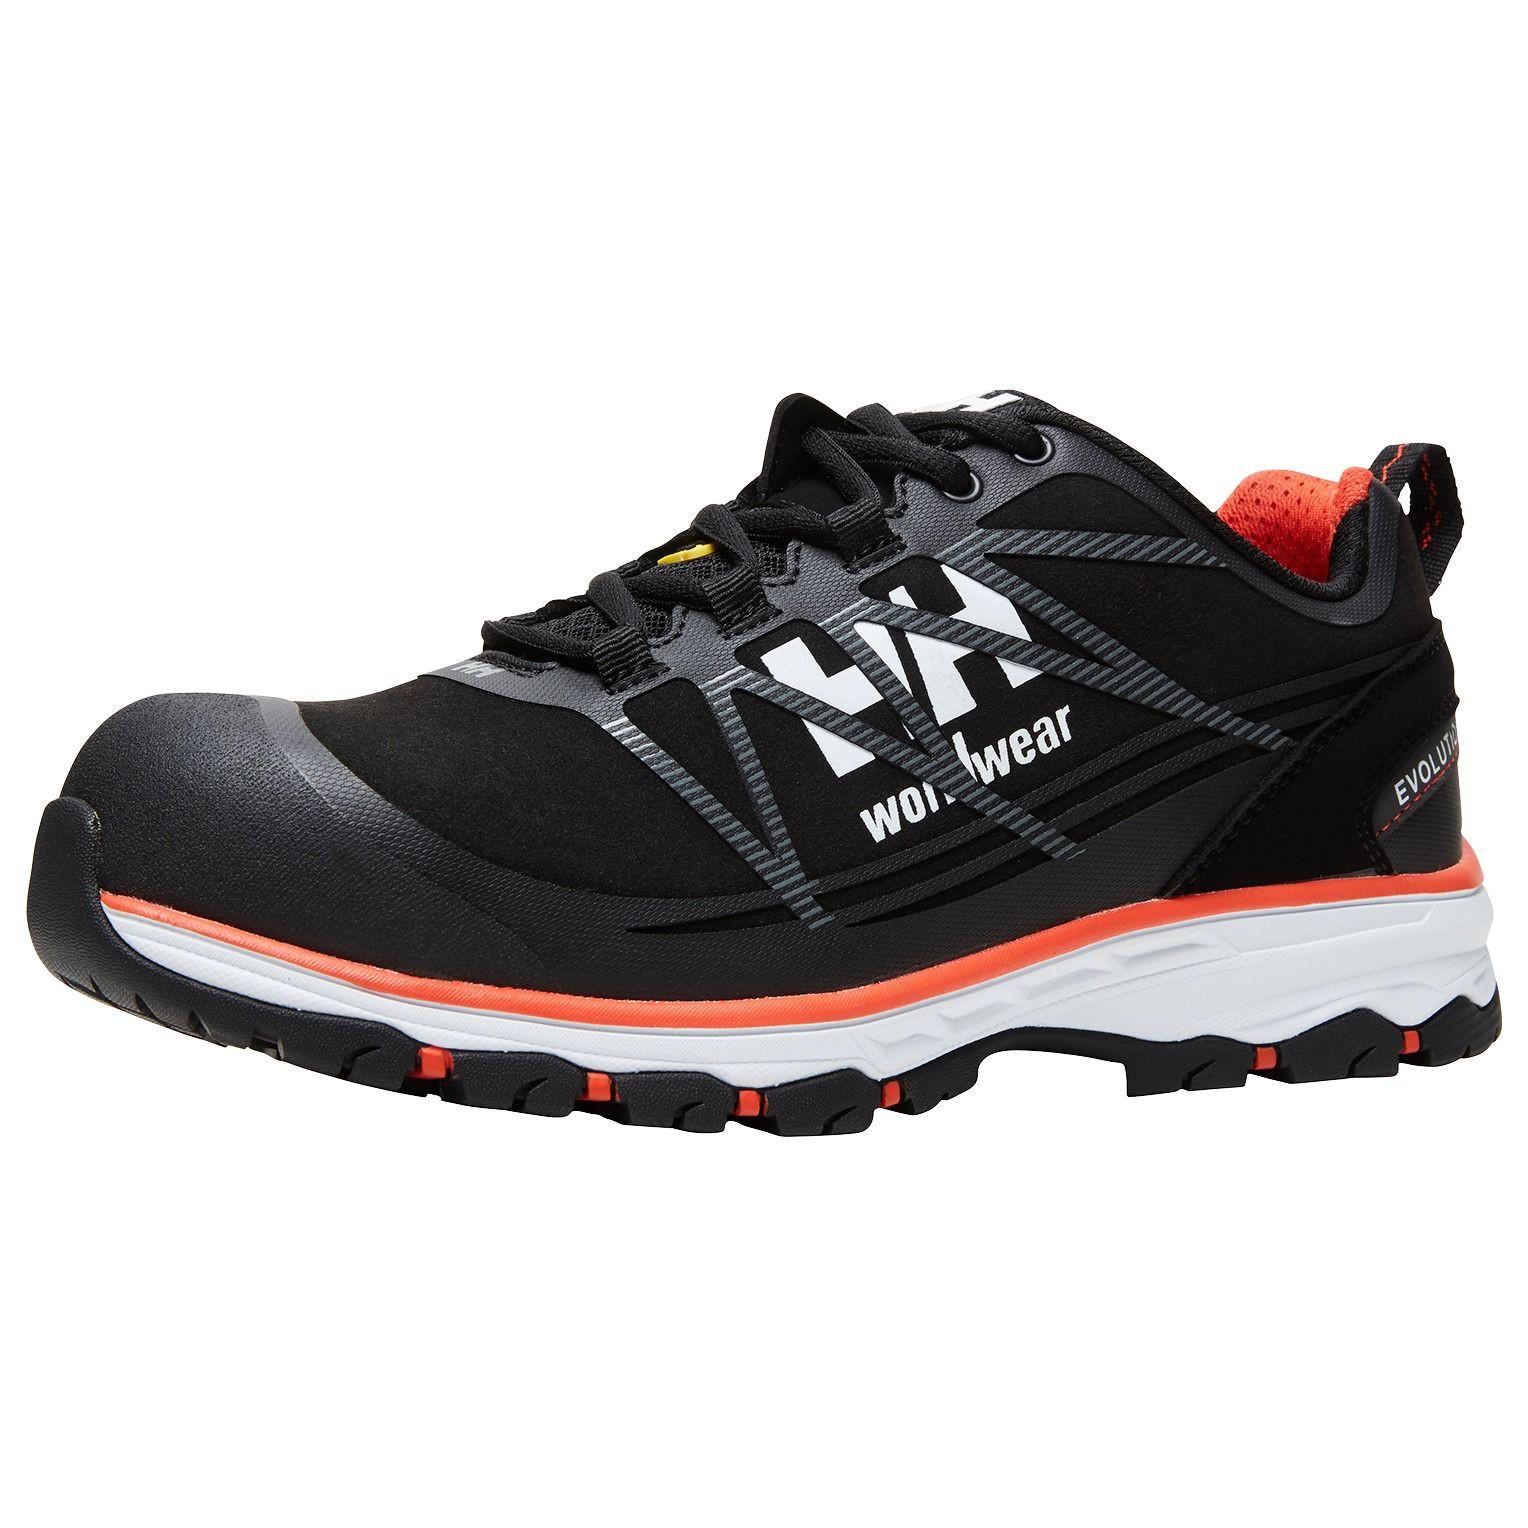 Демисезонные ботинки Helly Hansen Chelsea Evolution Low - 78224 (Black / Orange; 44)